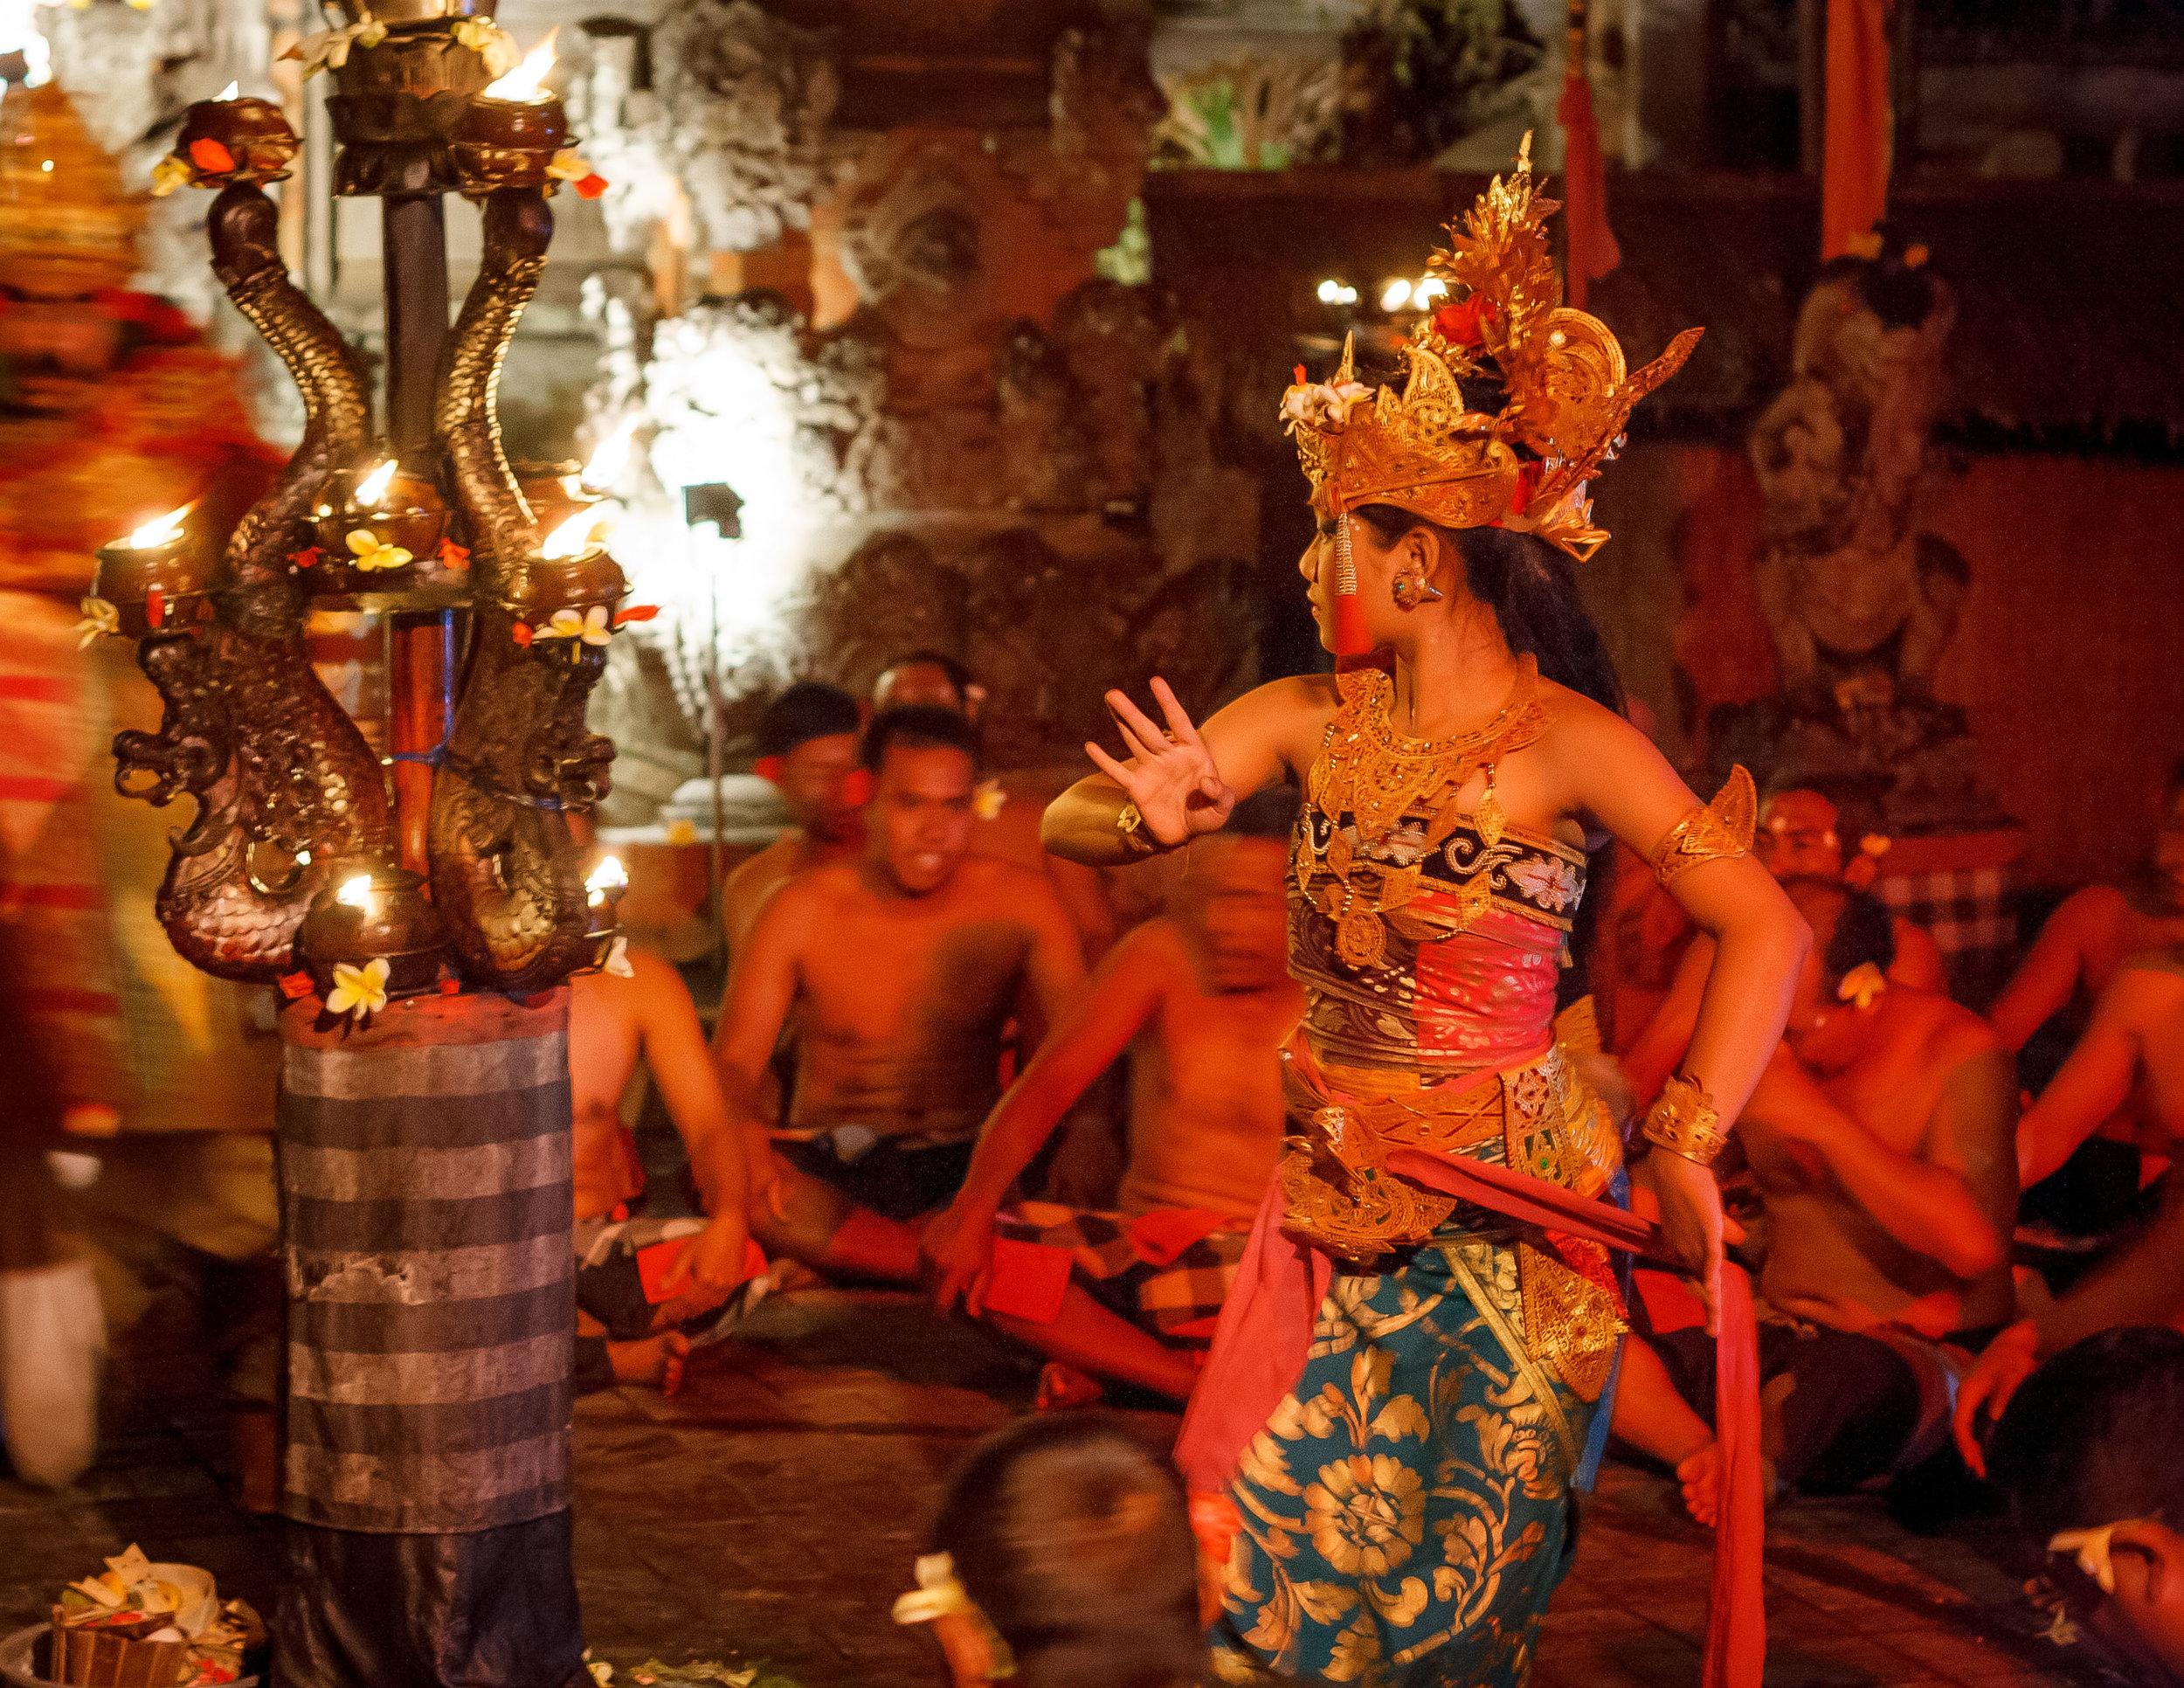 Bali Itinerary 7 days: Cultural Dance